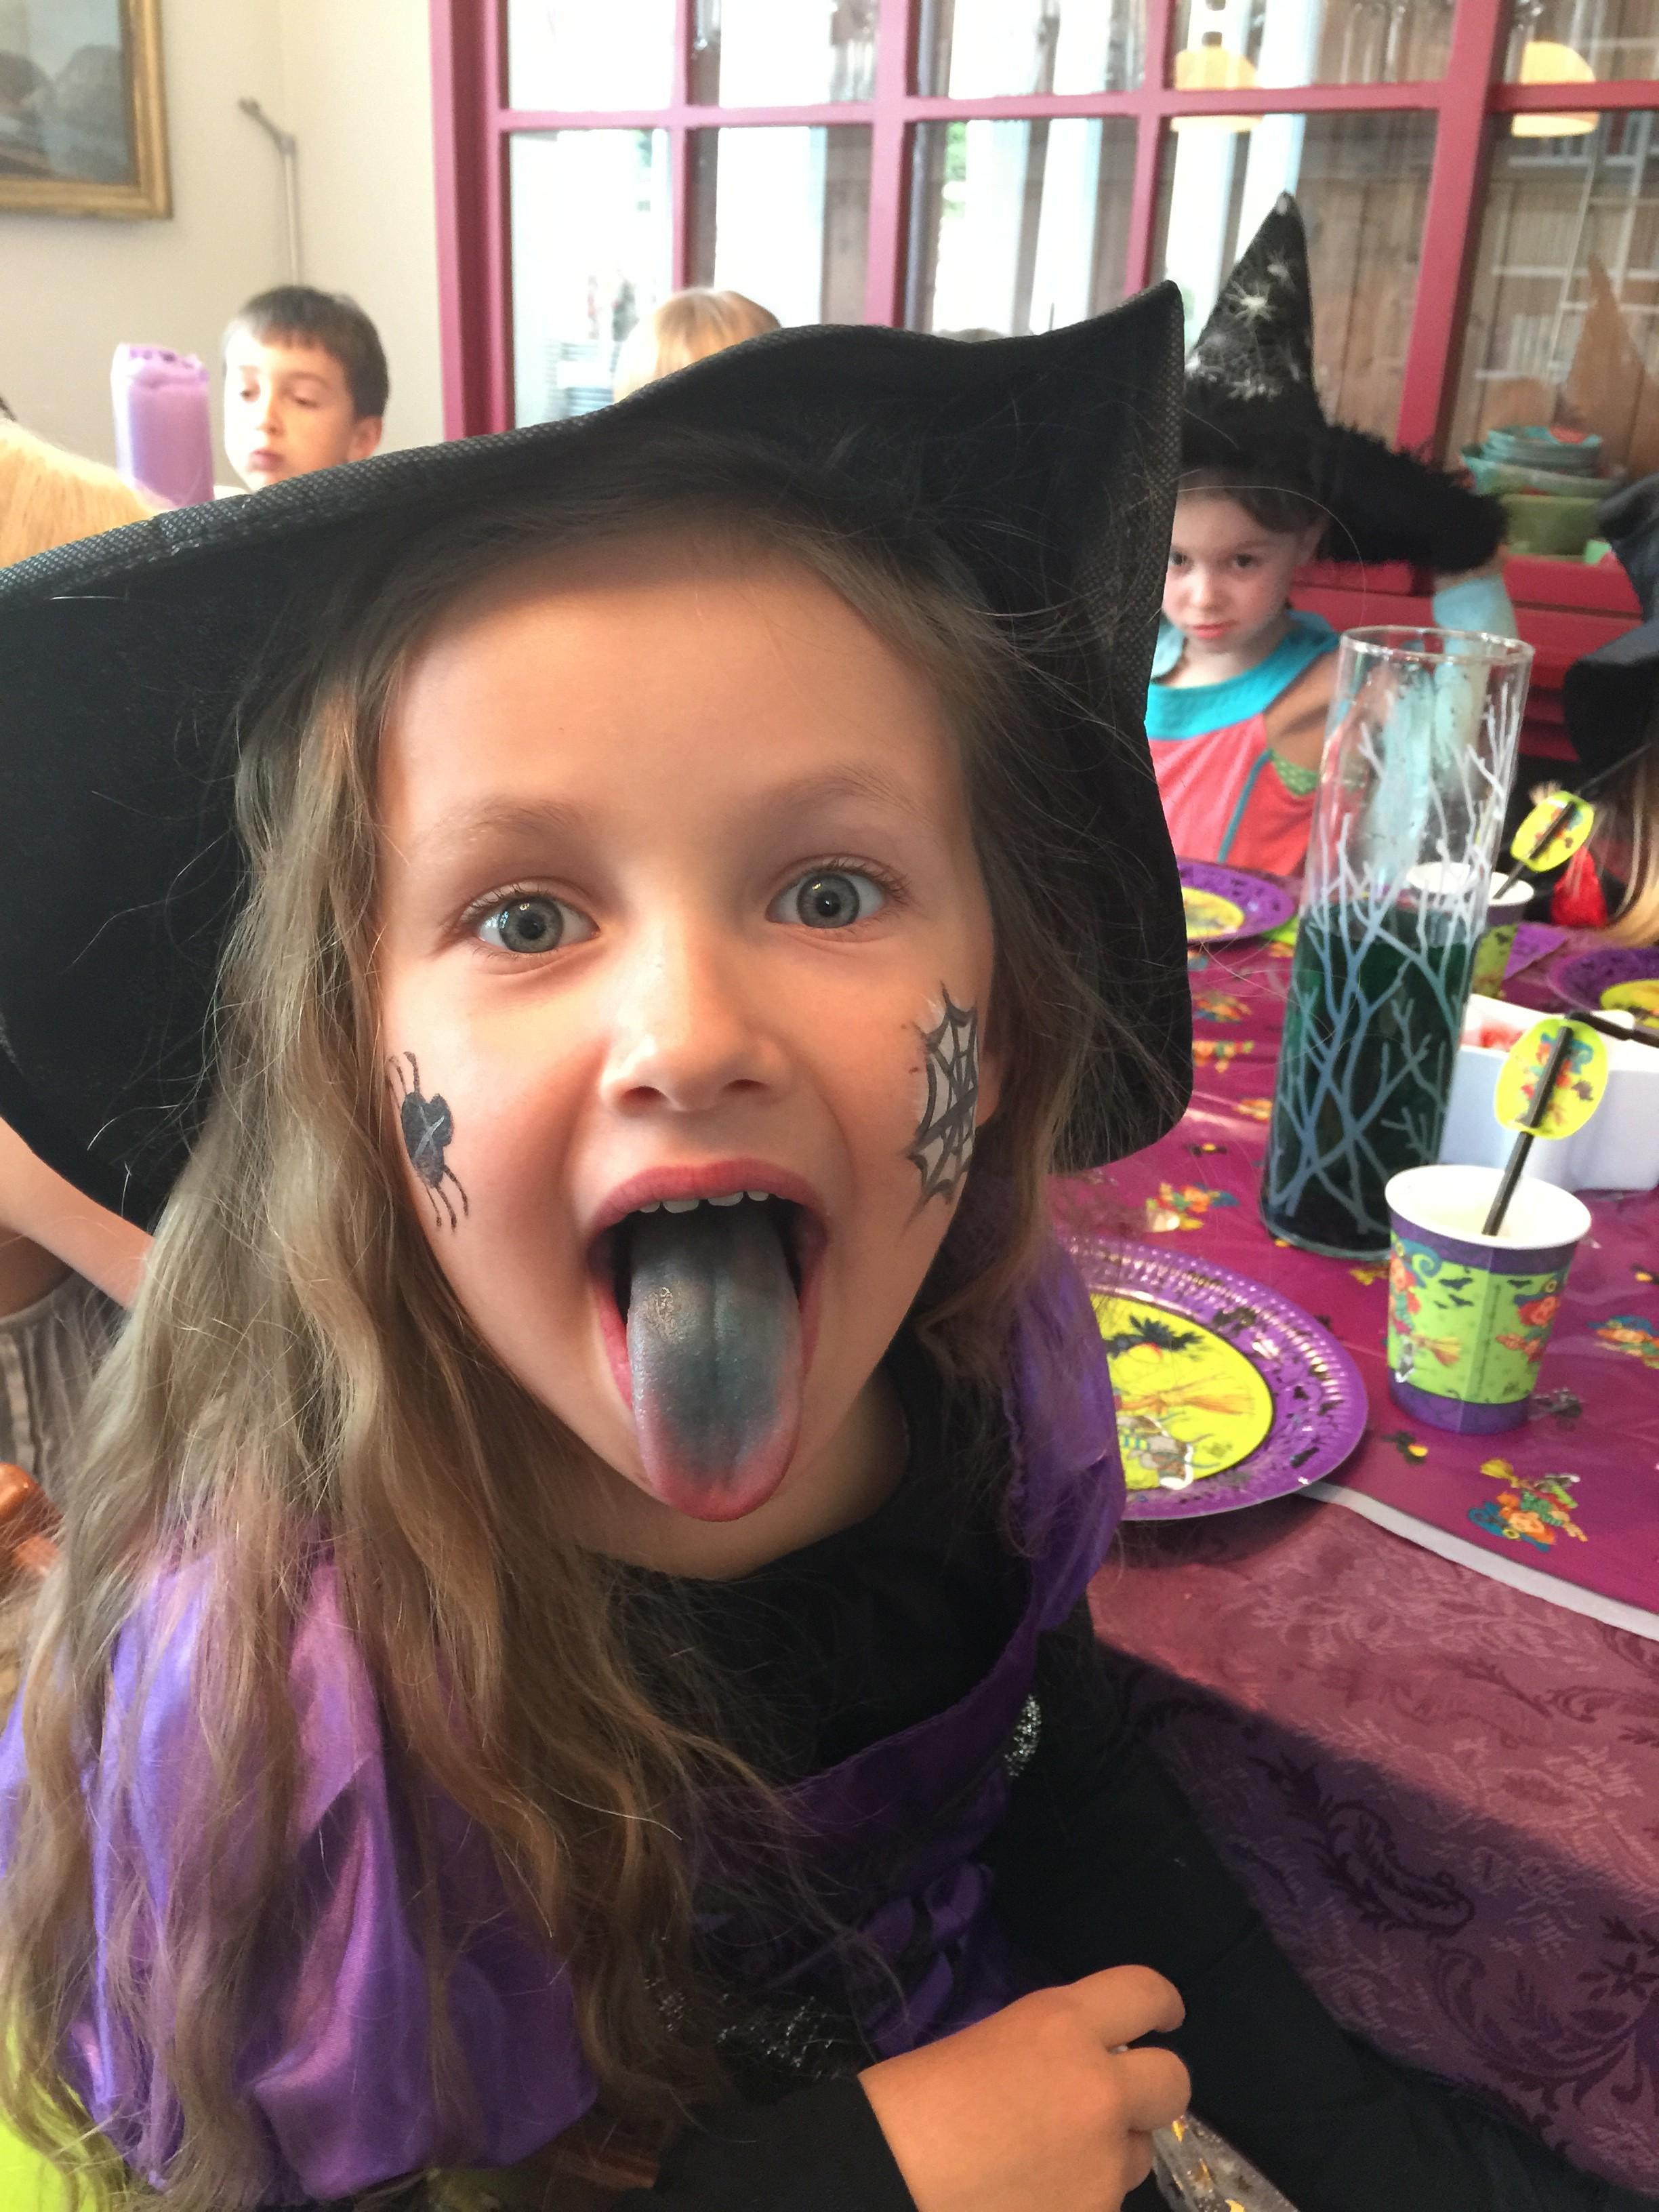 Hexengeburtstag, Kindergeburtstag, feiern, Geburtstagsparty